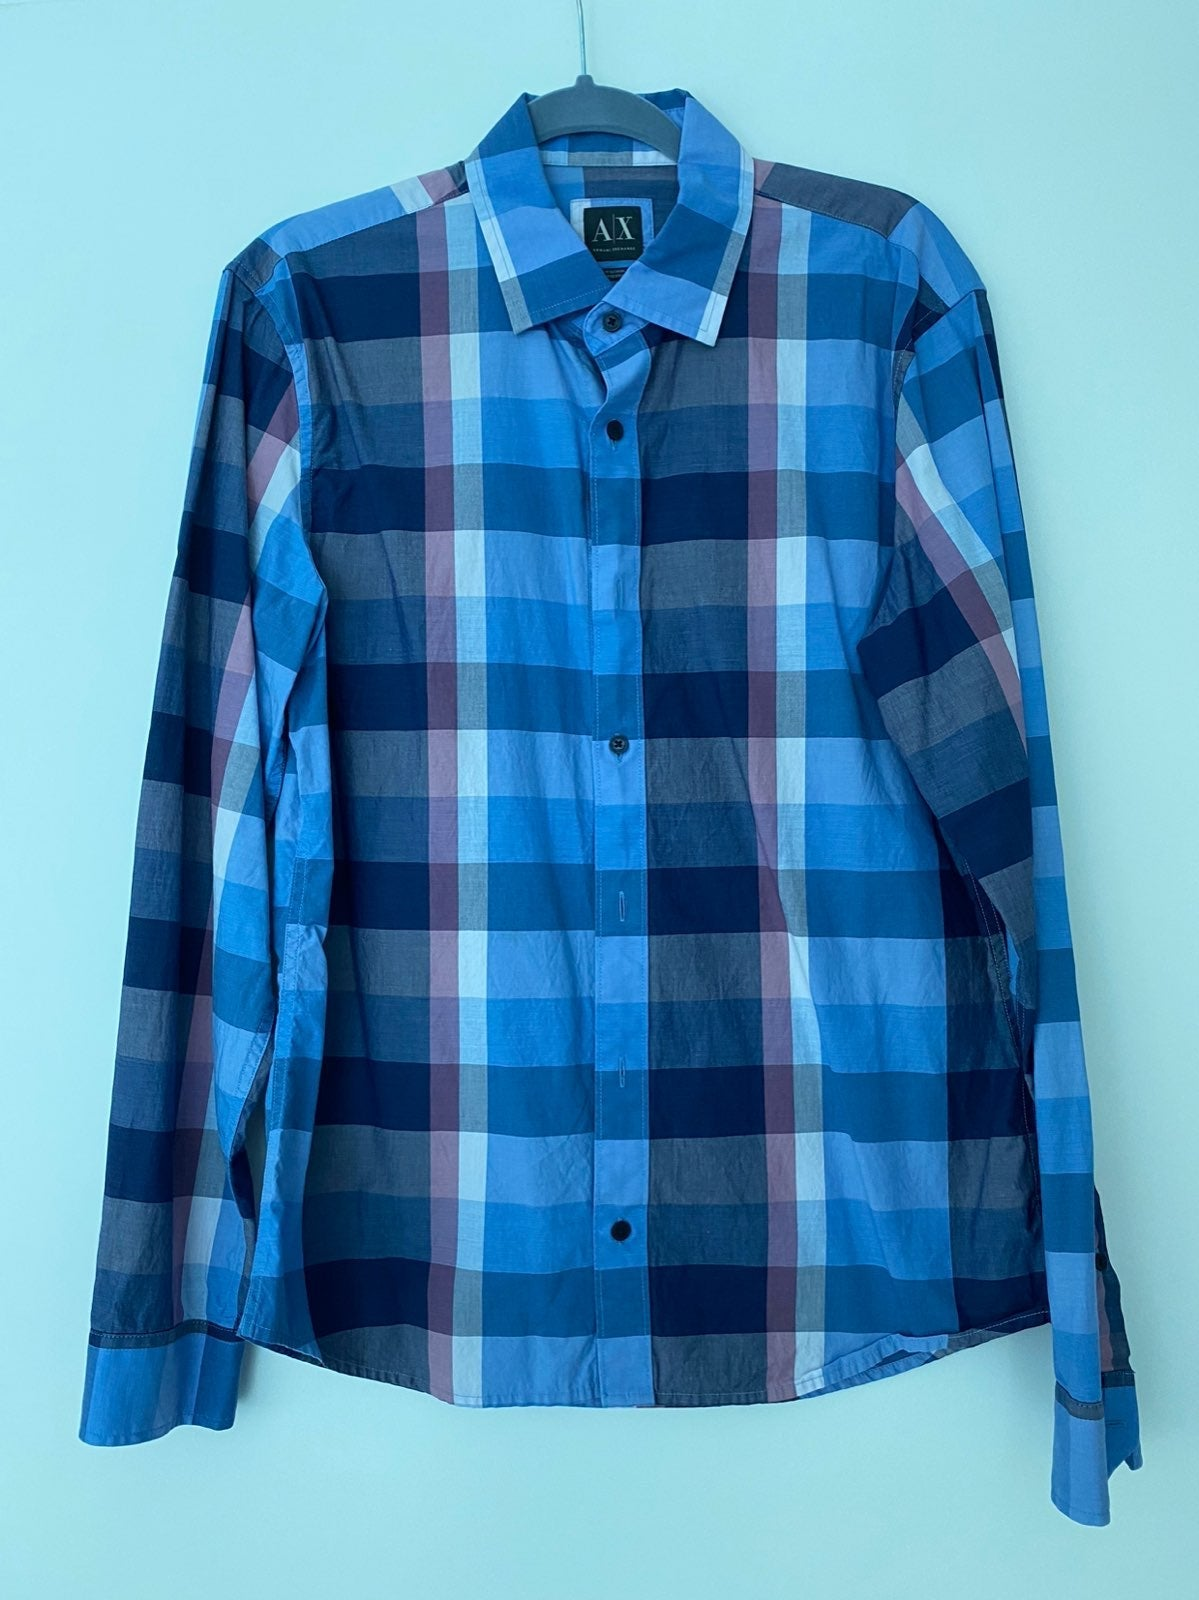 AX Mens Long Sleeve Plais Shirt Medium